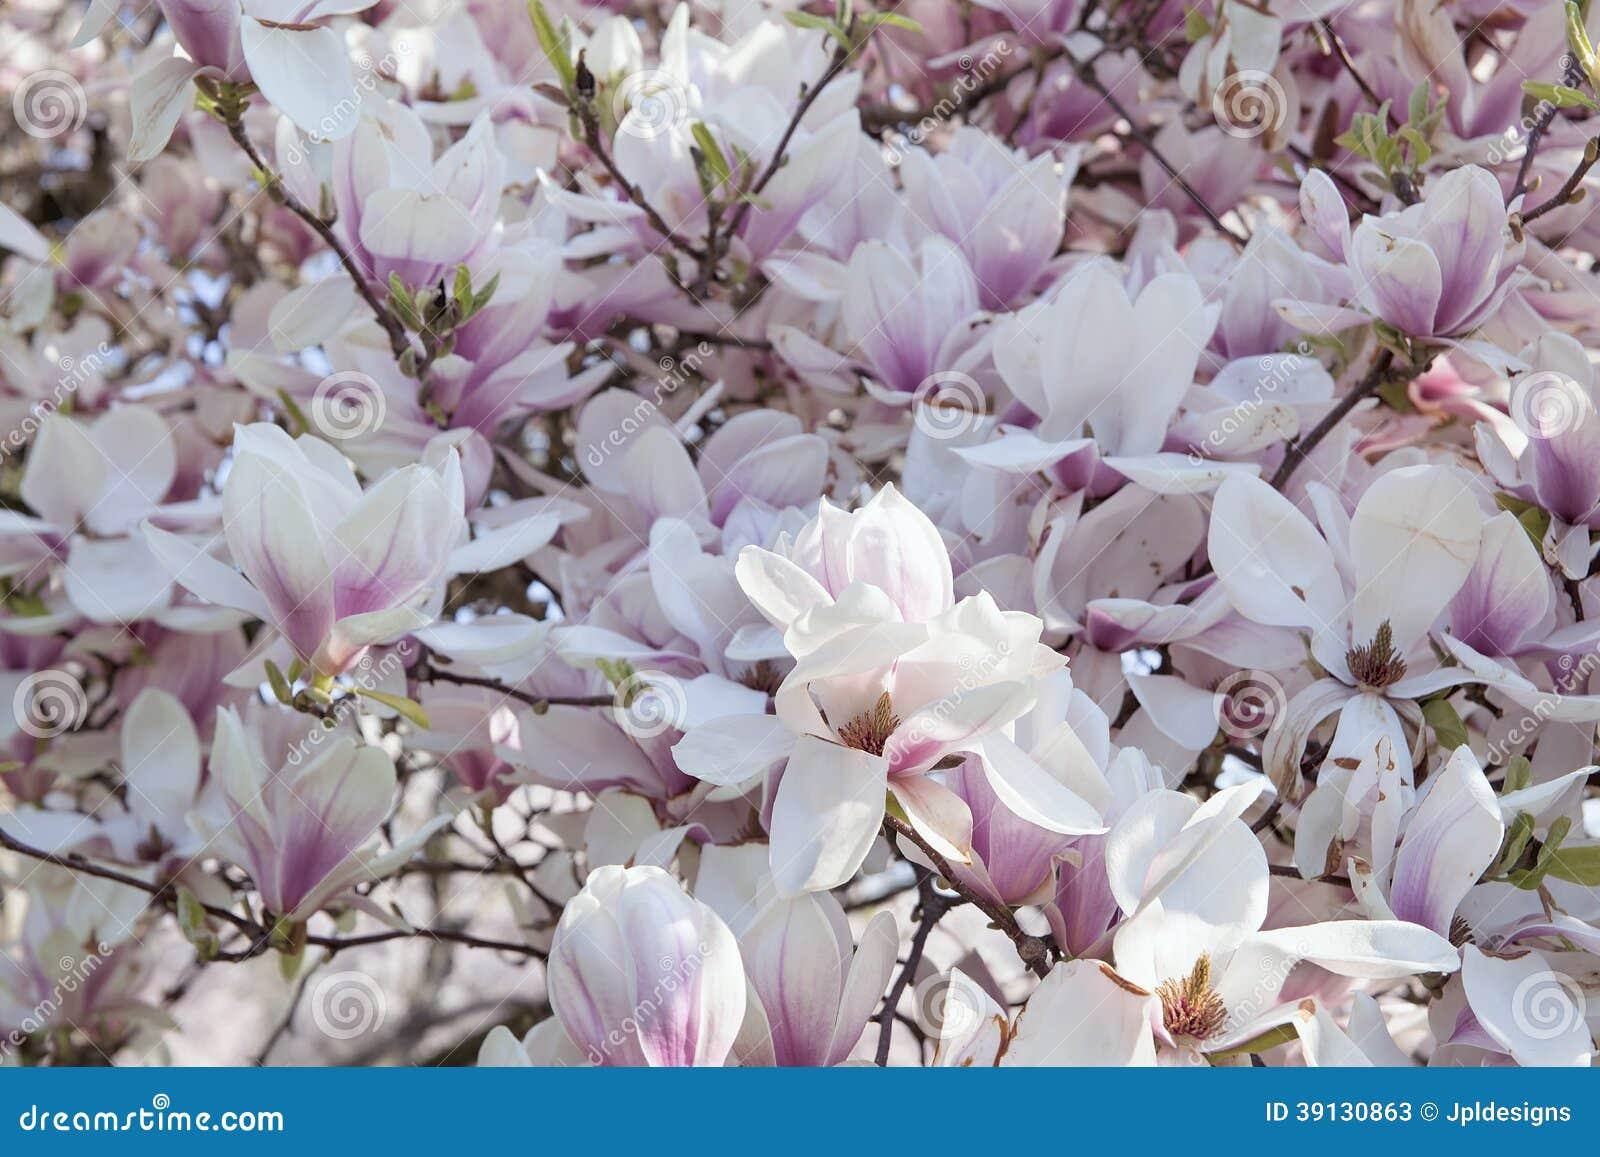 Deciduous Magnolia Tree In Full Bloom Stock Image Image Of White